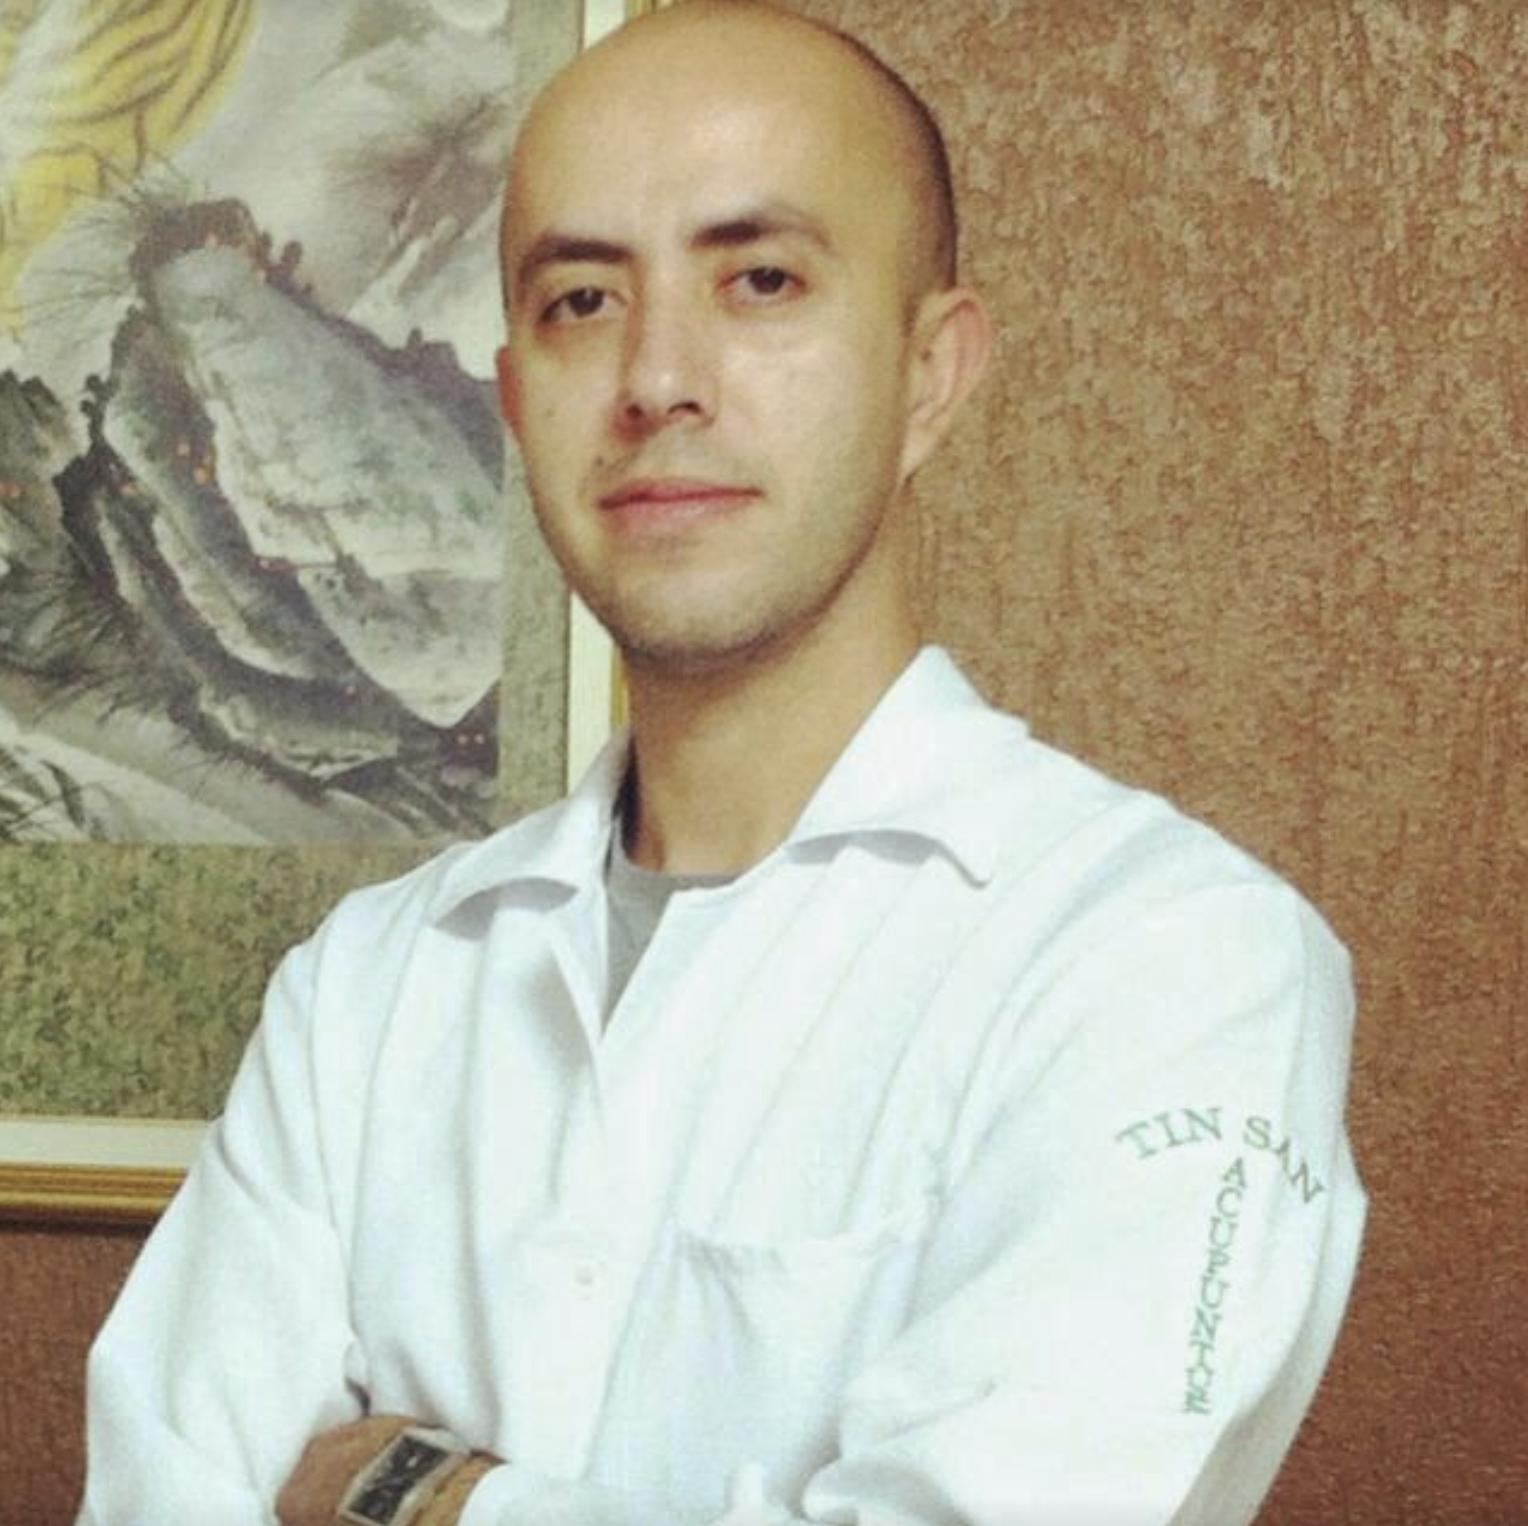 Leandro Assis Teixeira